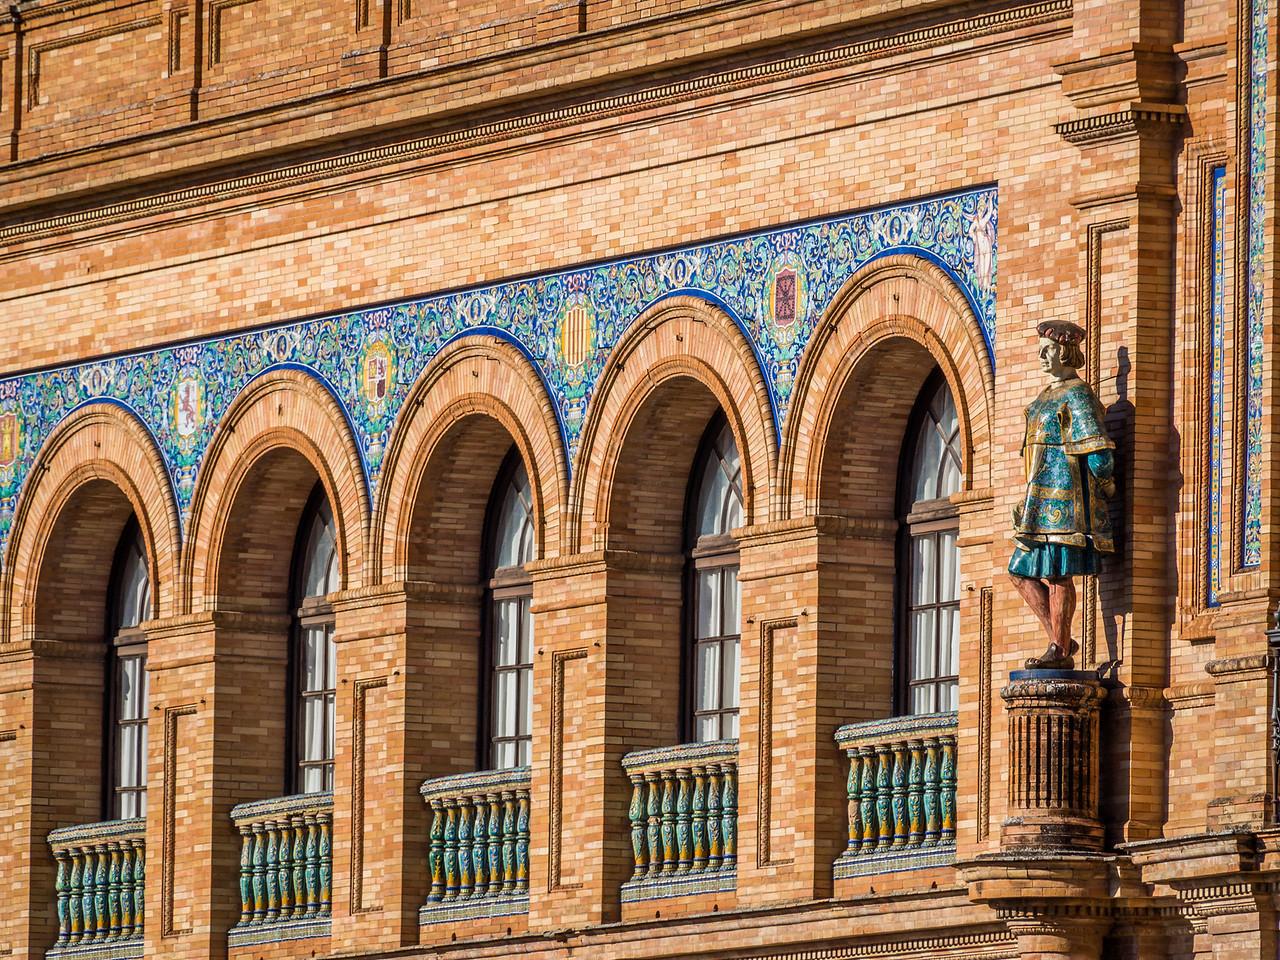 Arched Windows, Plaza de España, Seville, Spain